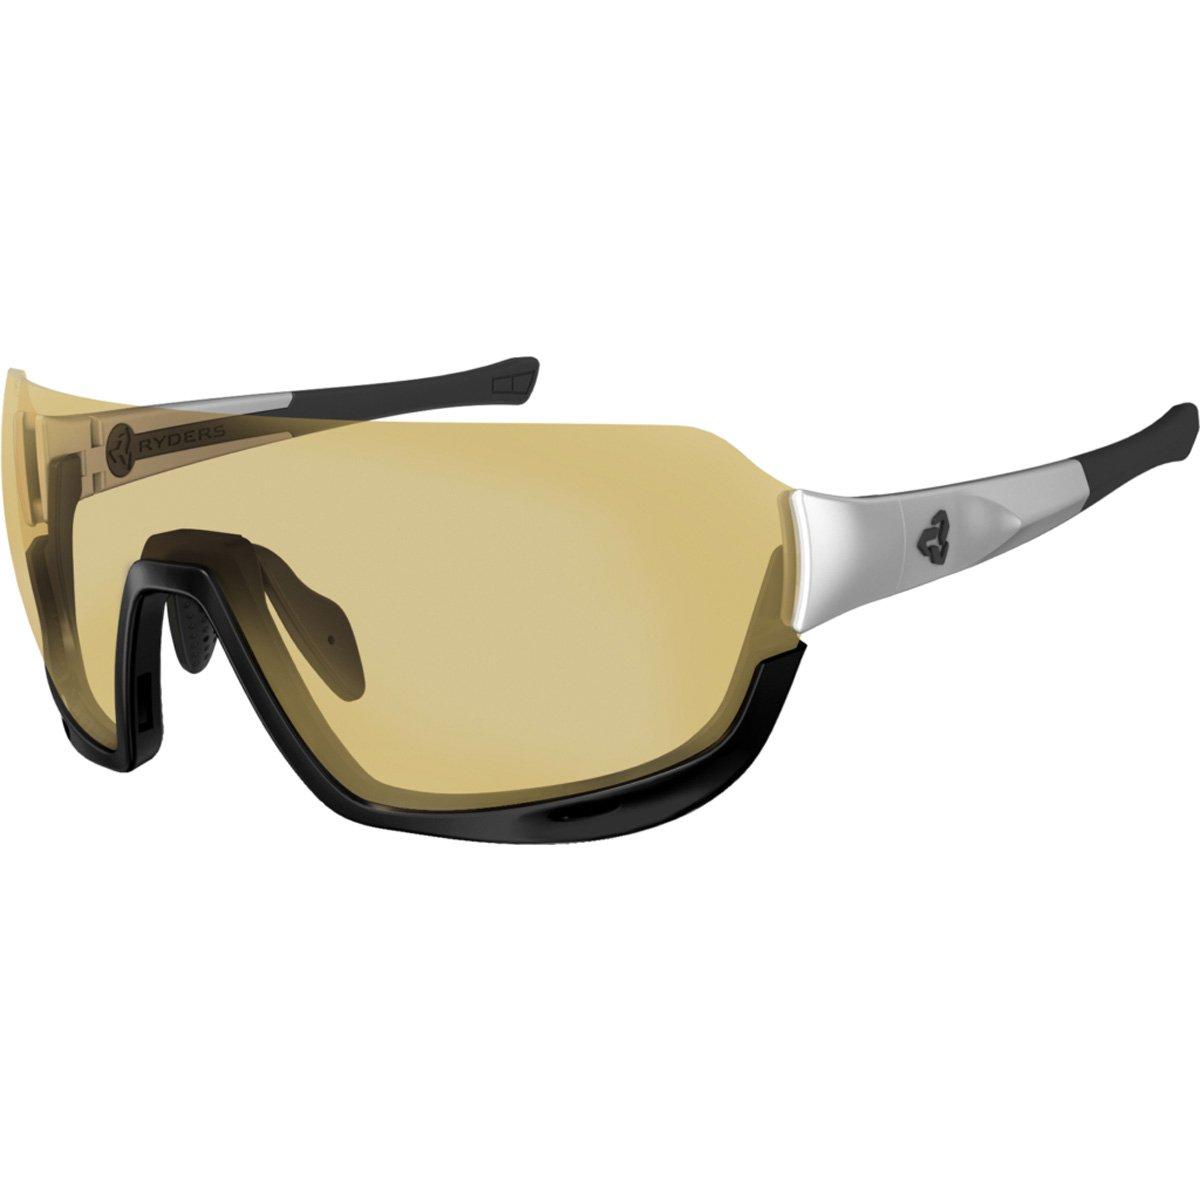 d52b6f7b0ed Ryders Eyewear Roam Photochromic Sunglasses - Women s Frye Black-Grey